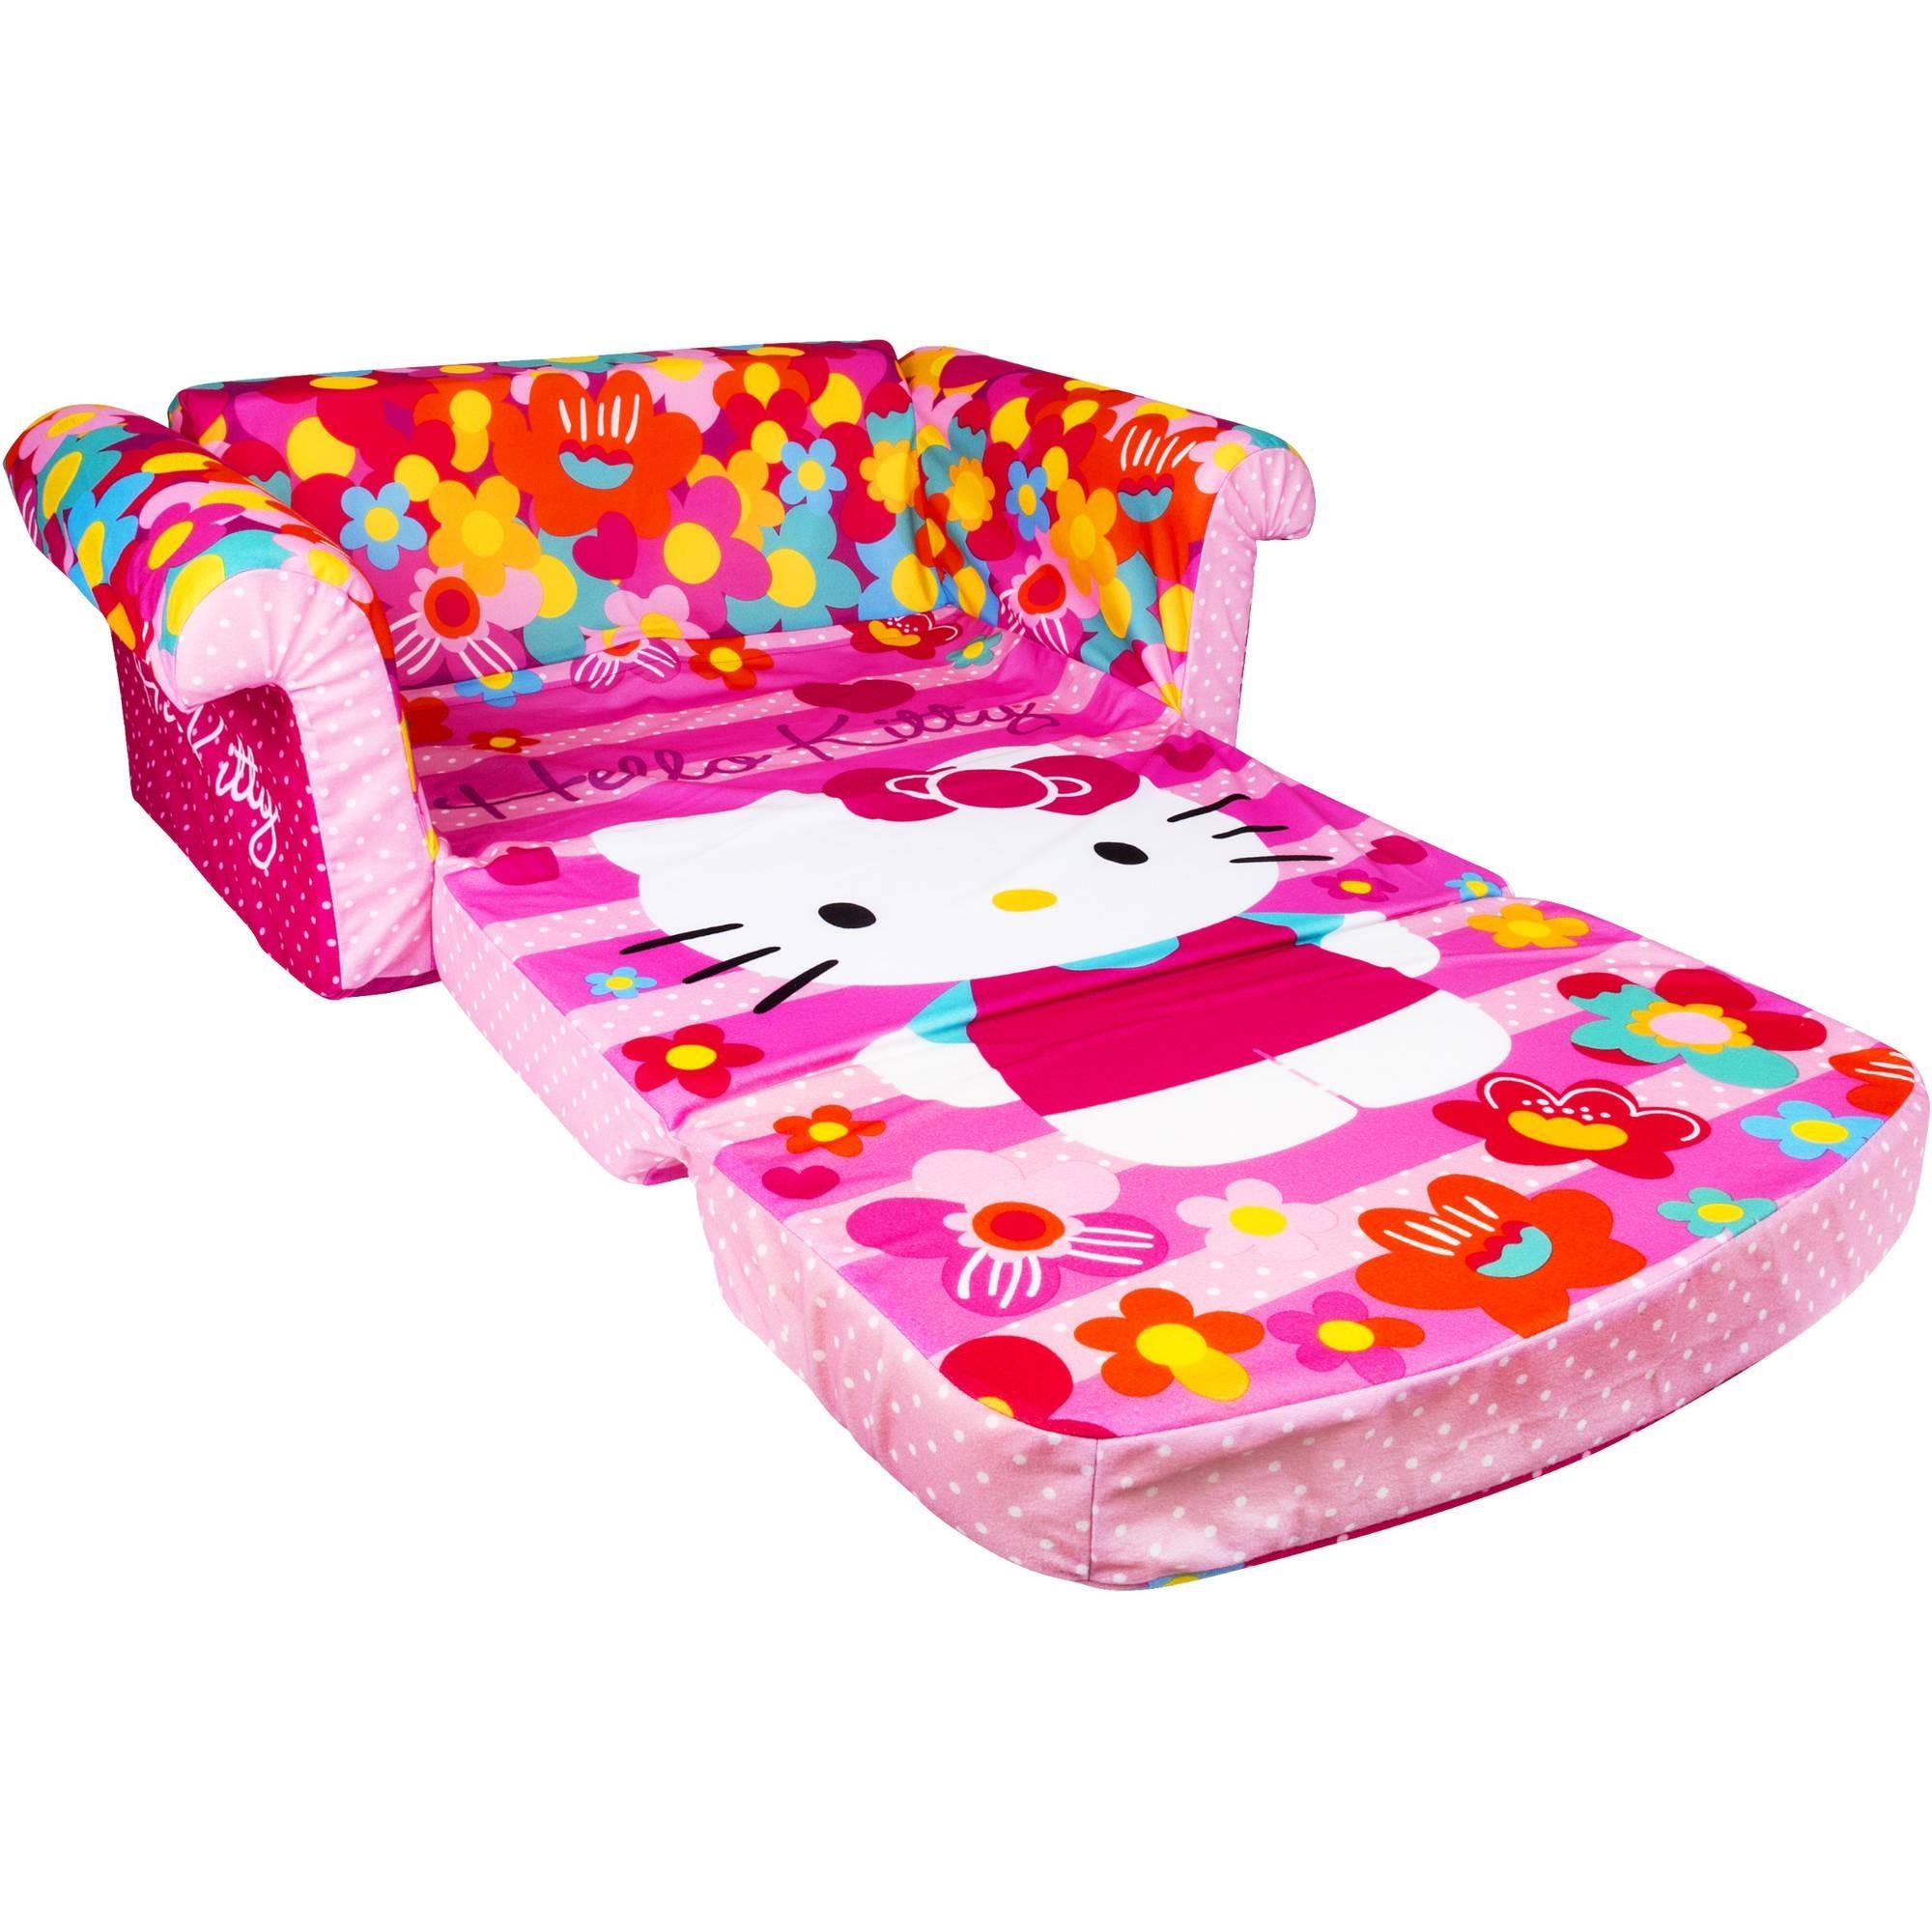 Marshmallow Furniture Flip Open Sofa, Hello Kitty – Walmart Throughout Flip Open Sofas For Toddlers (View 3 of 20)